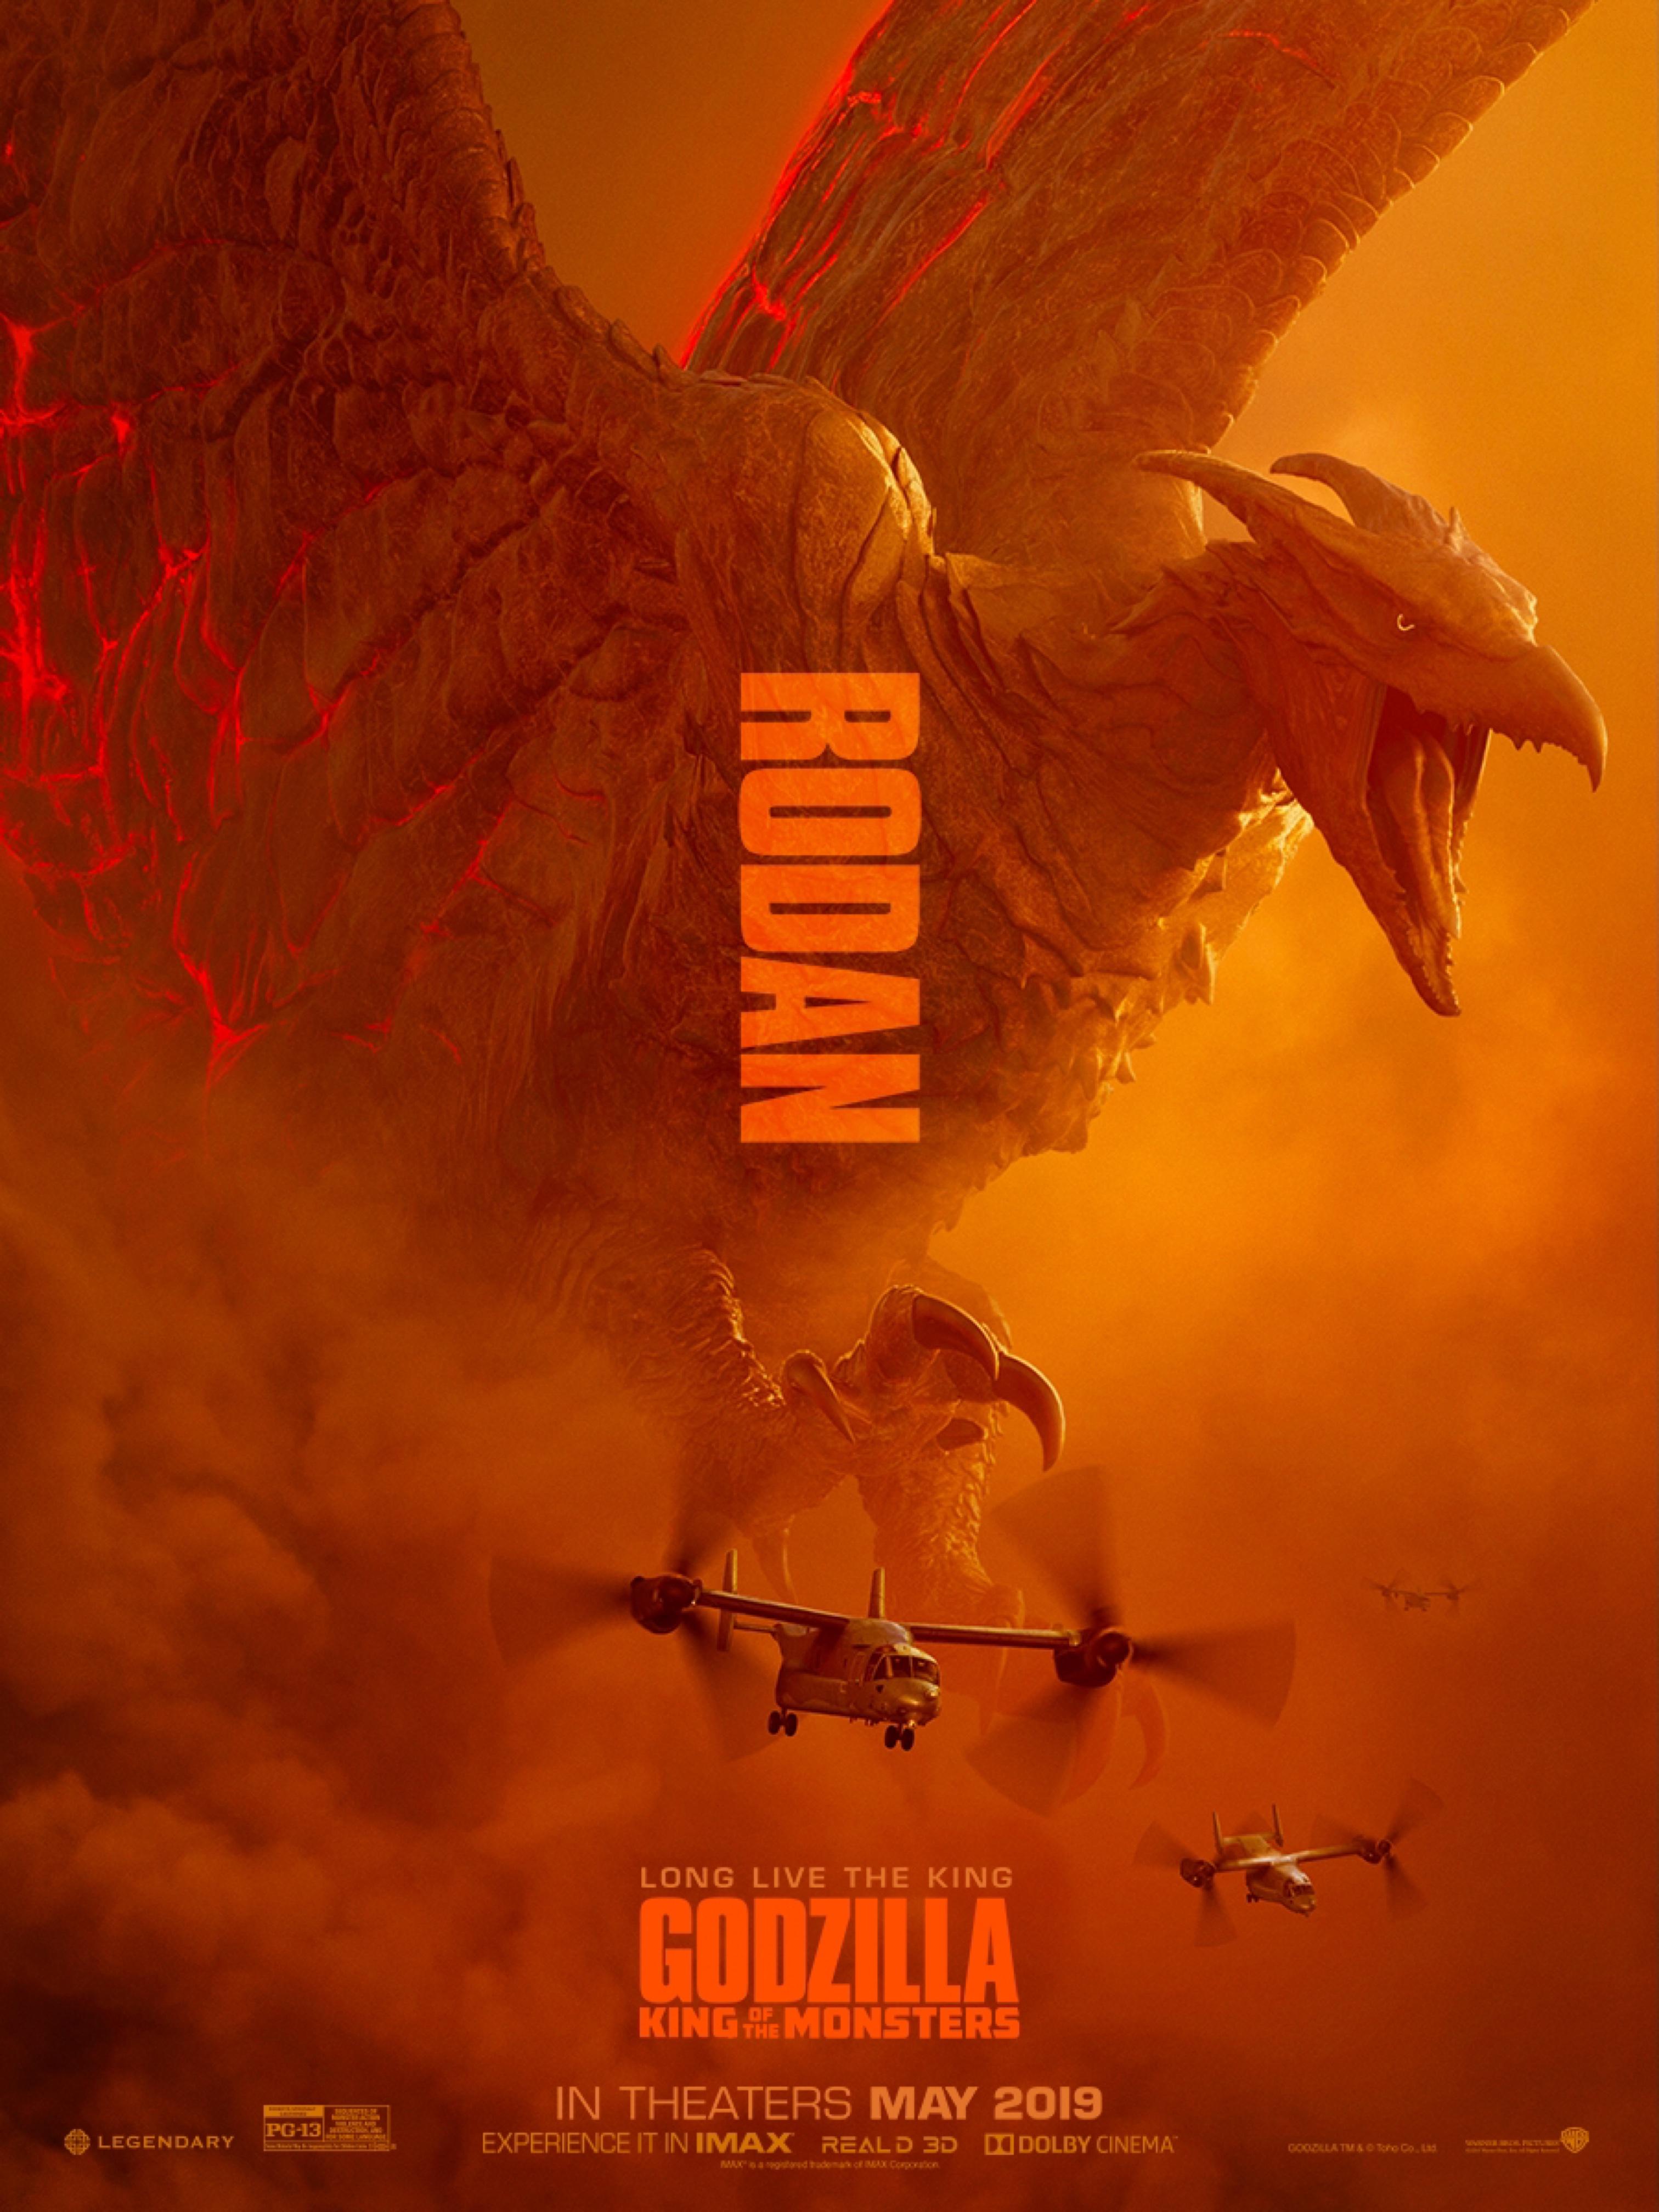 design 4 official movie poster design godzilla